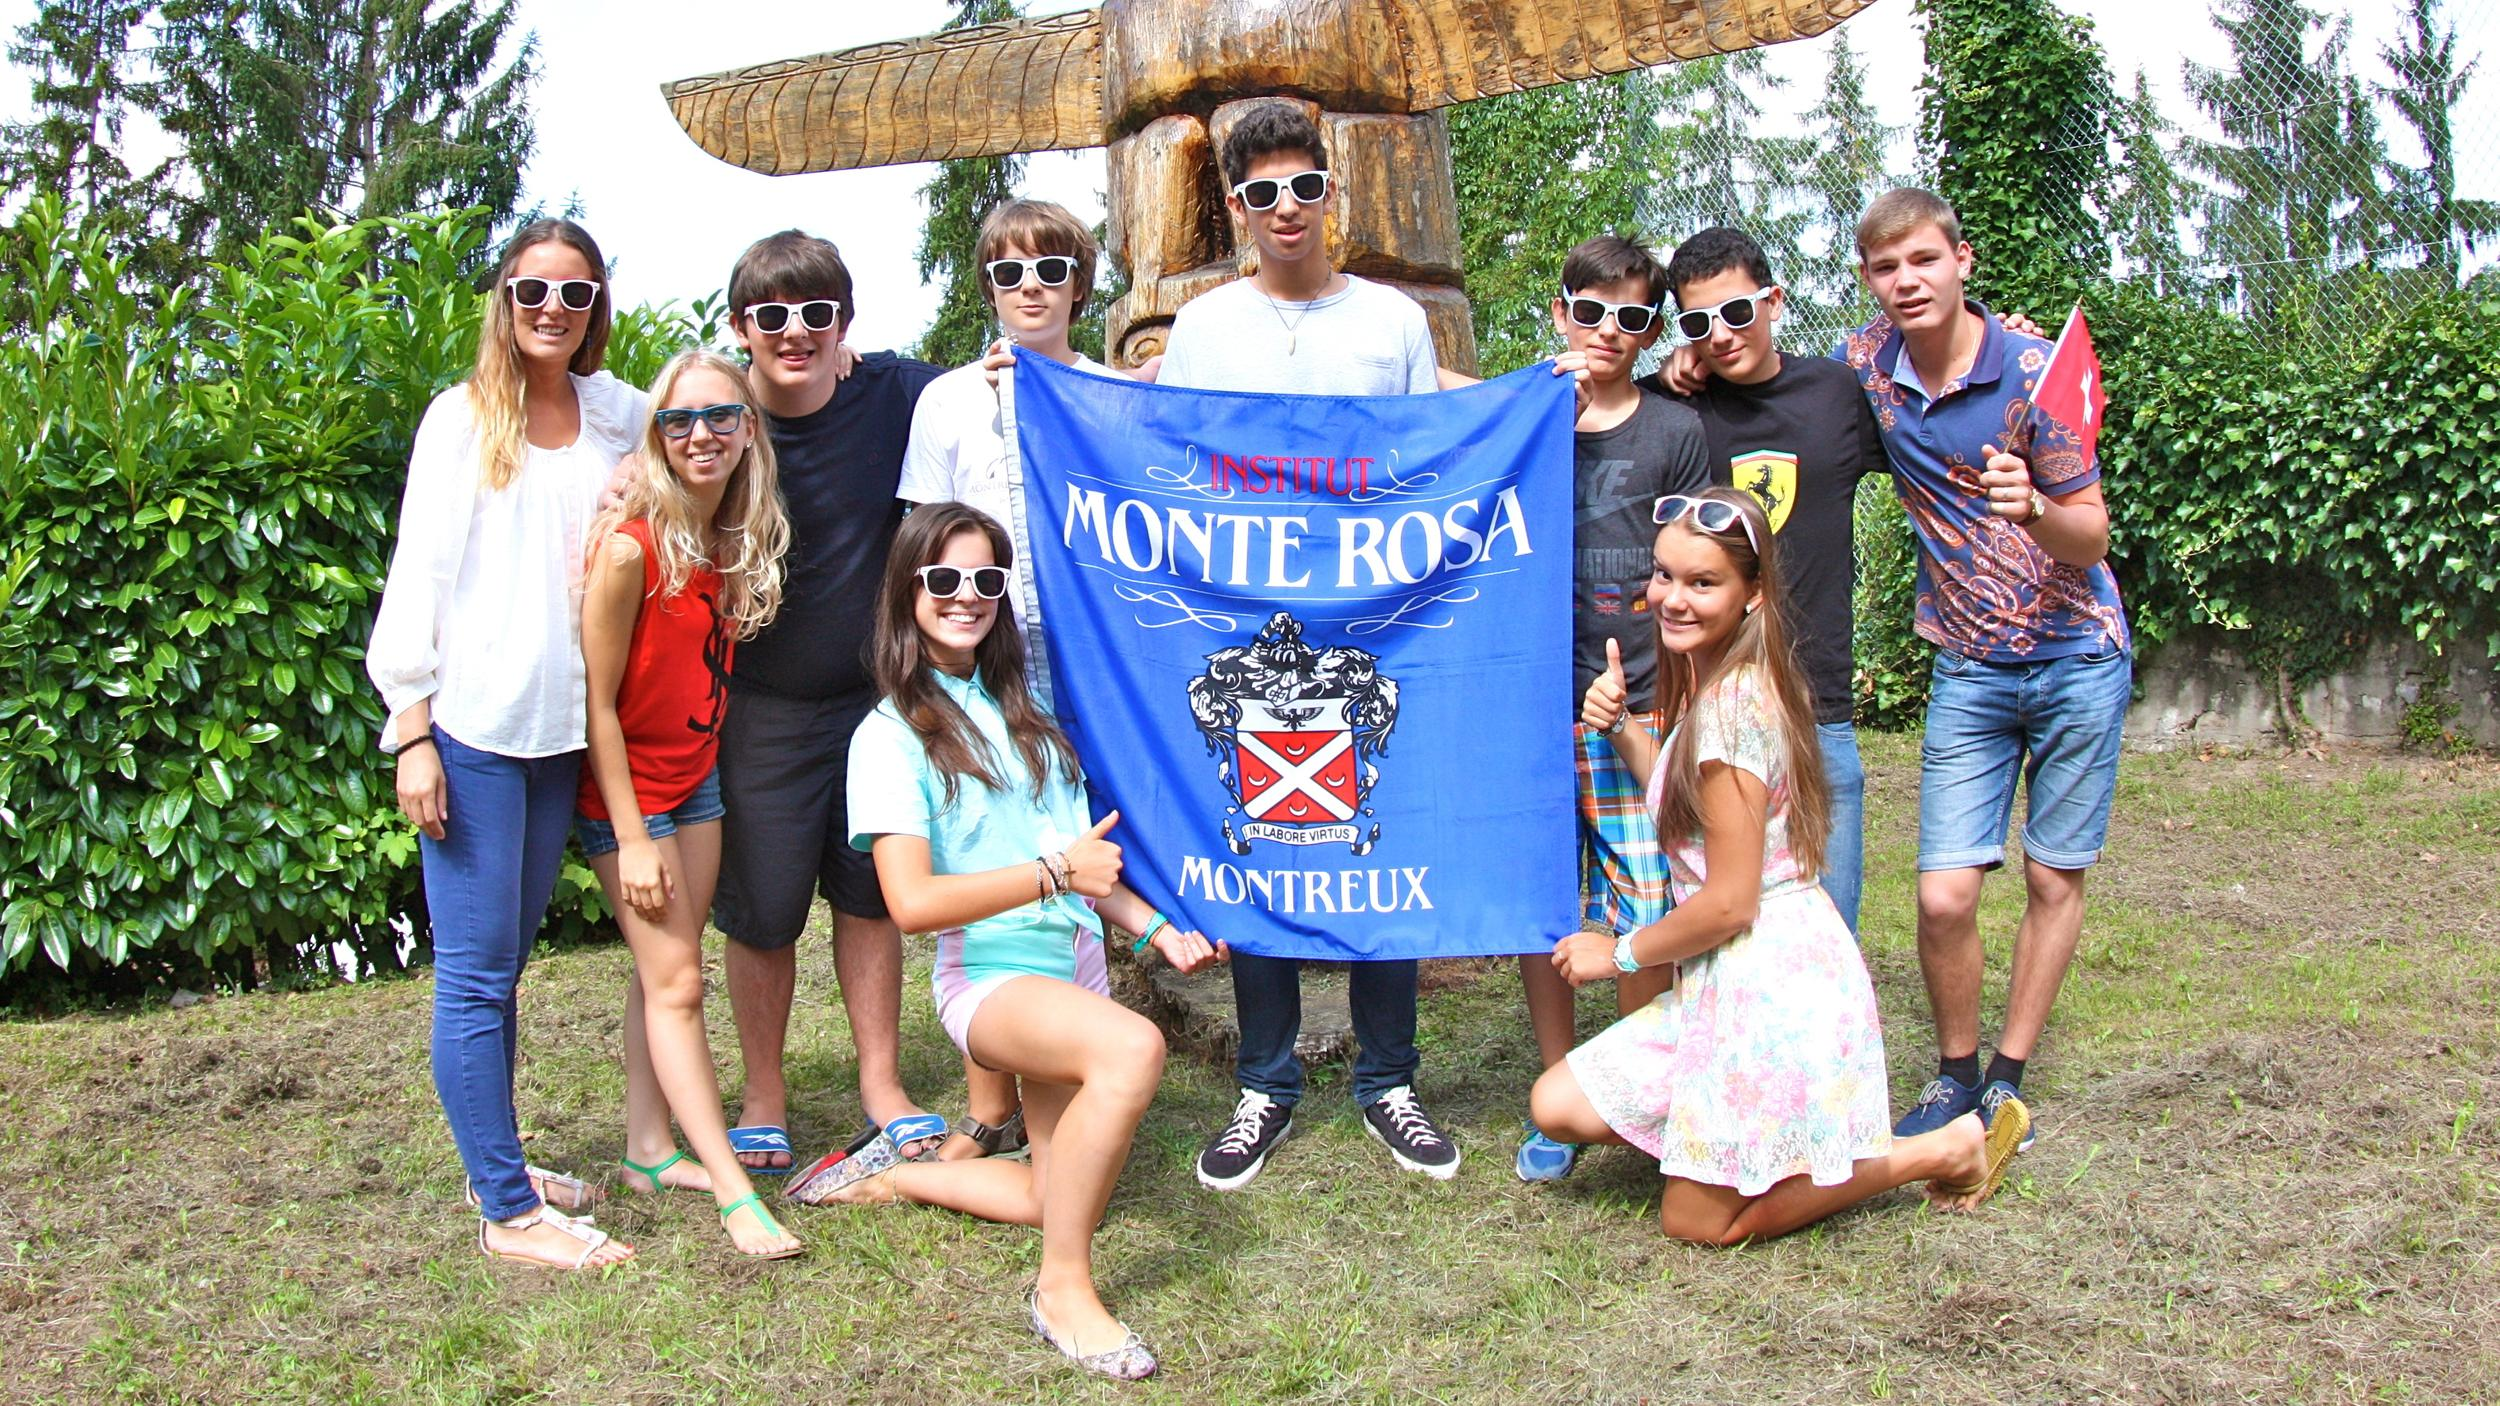 Monte Rosa Summer School